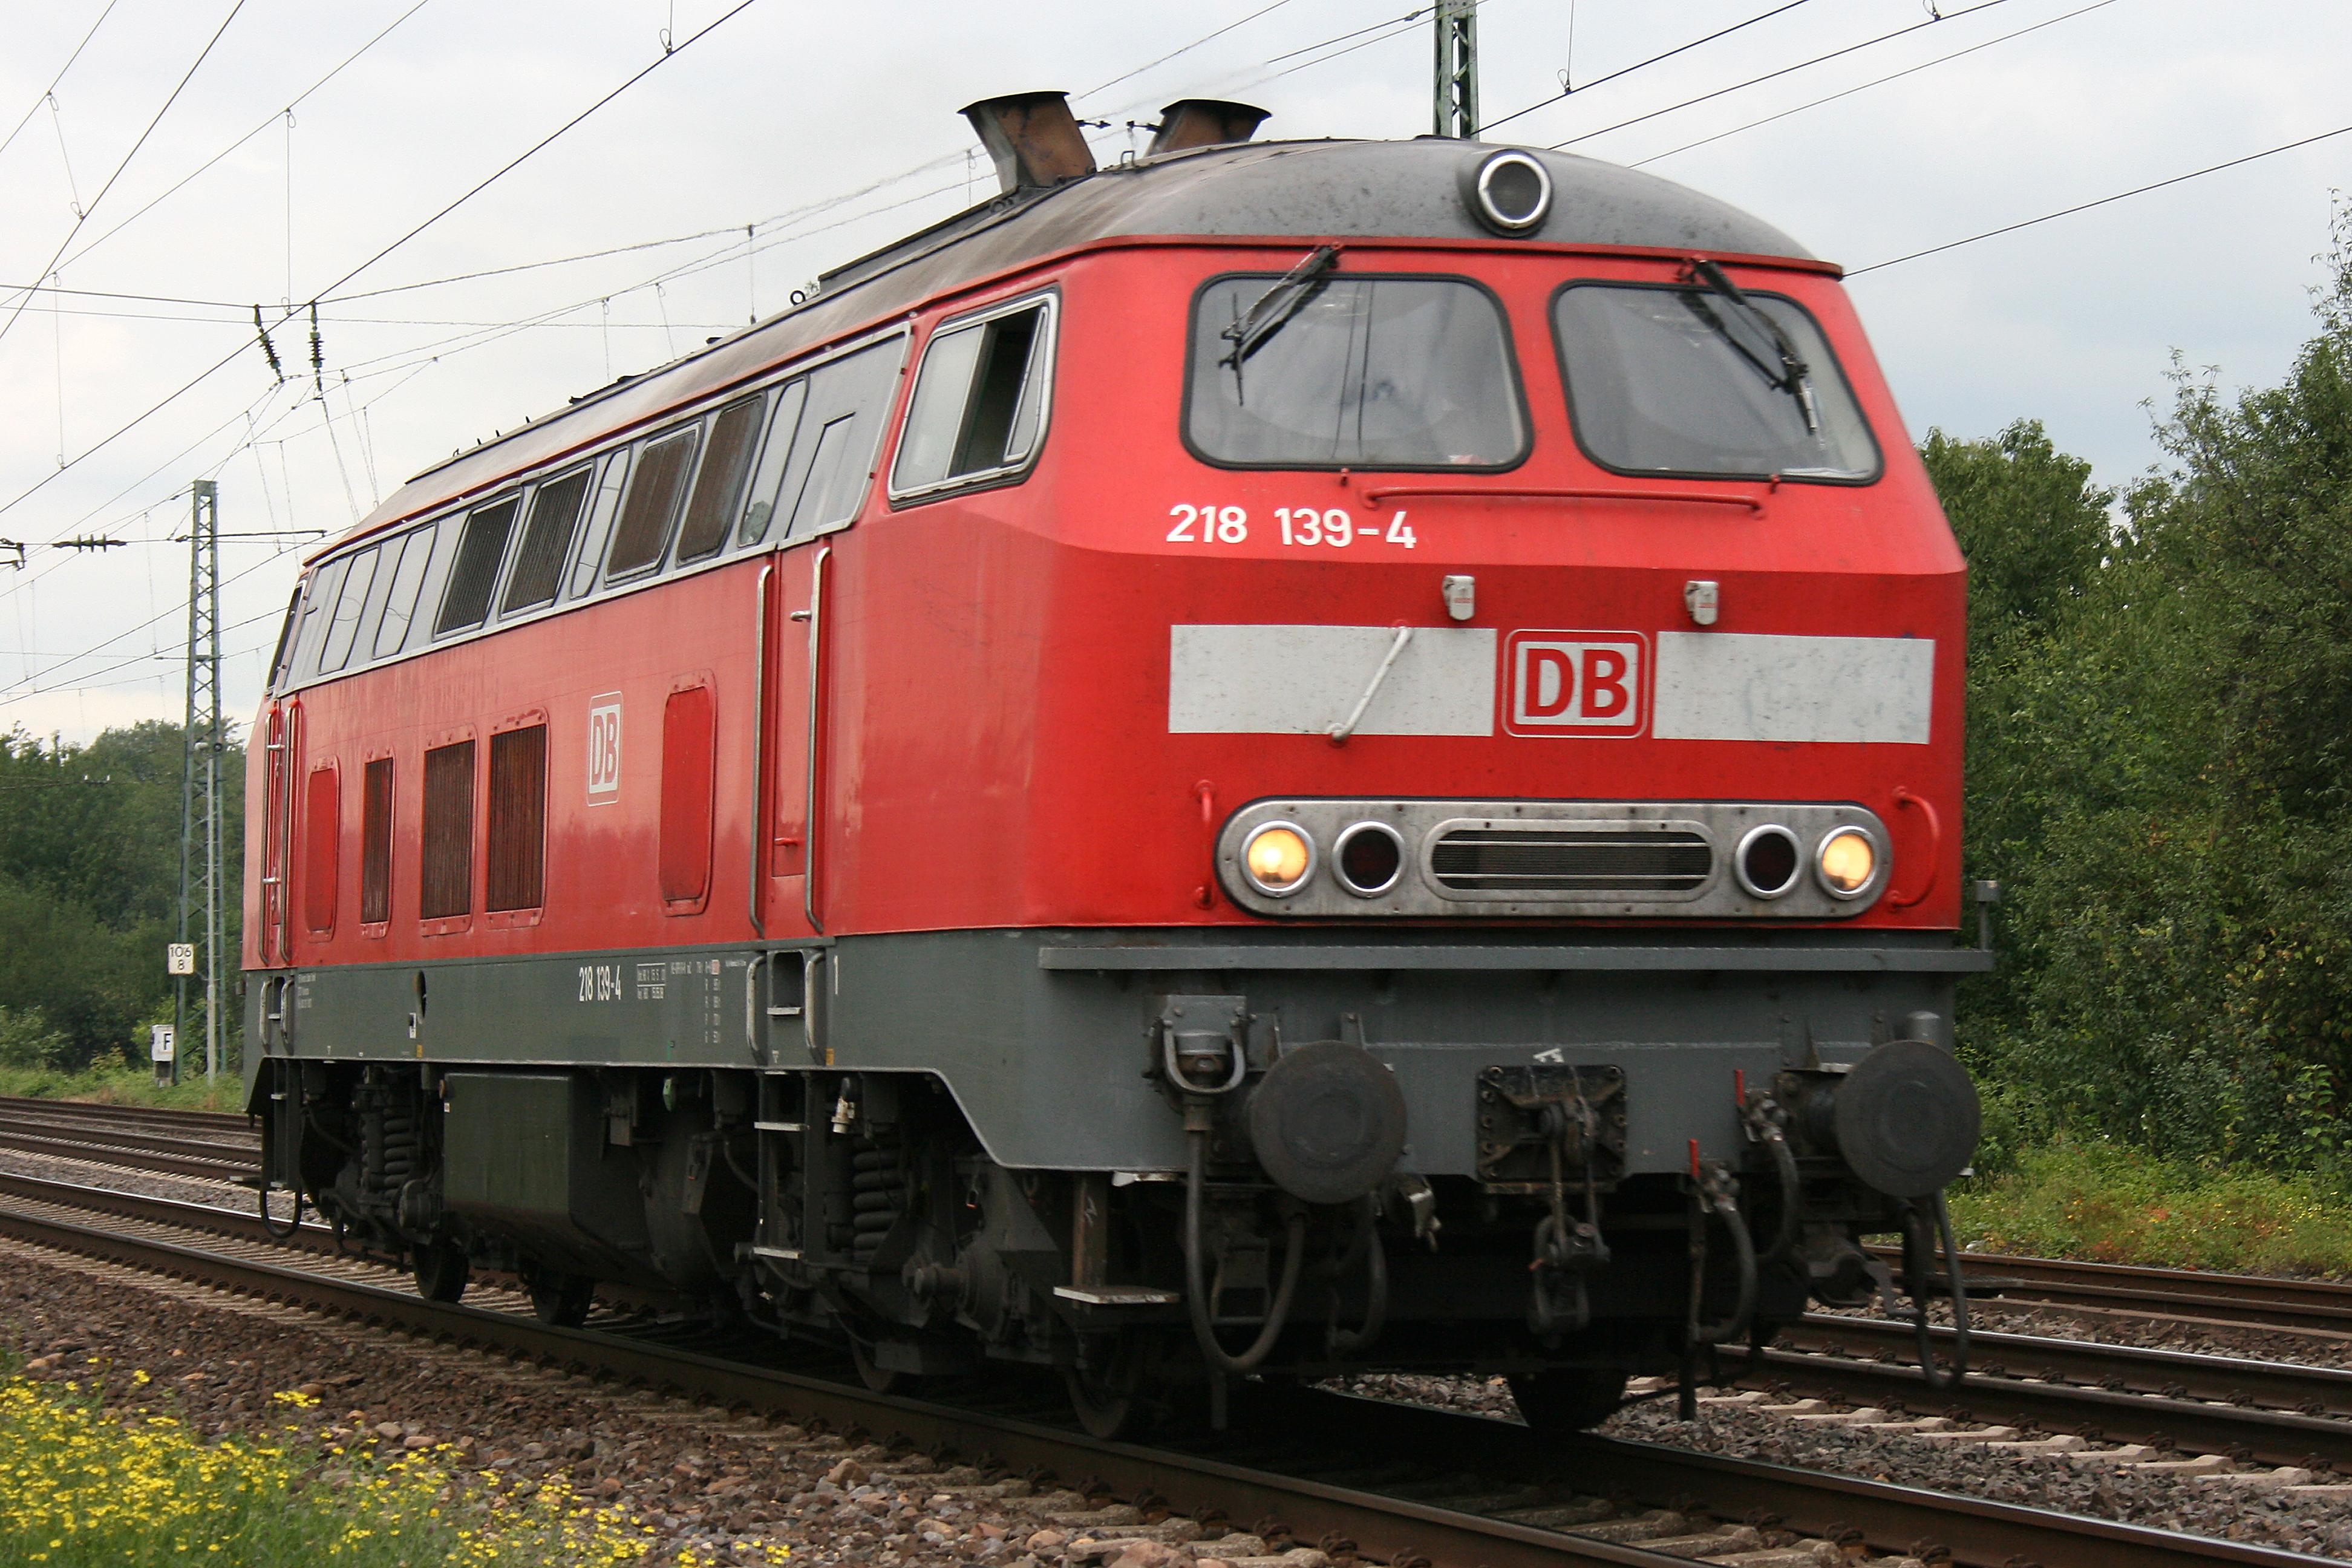 File:Baureihe 218 139-4.jpg